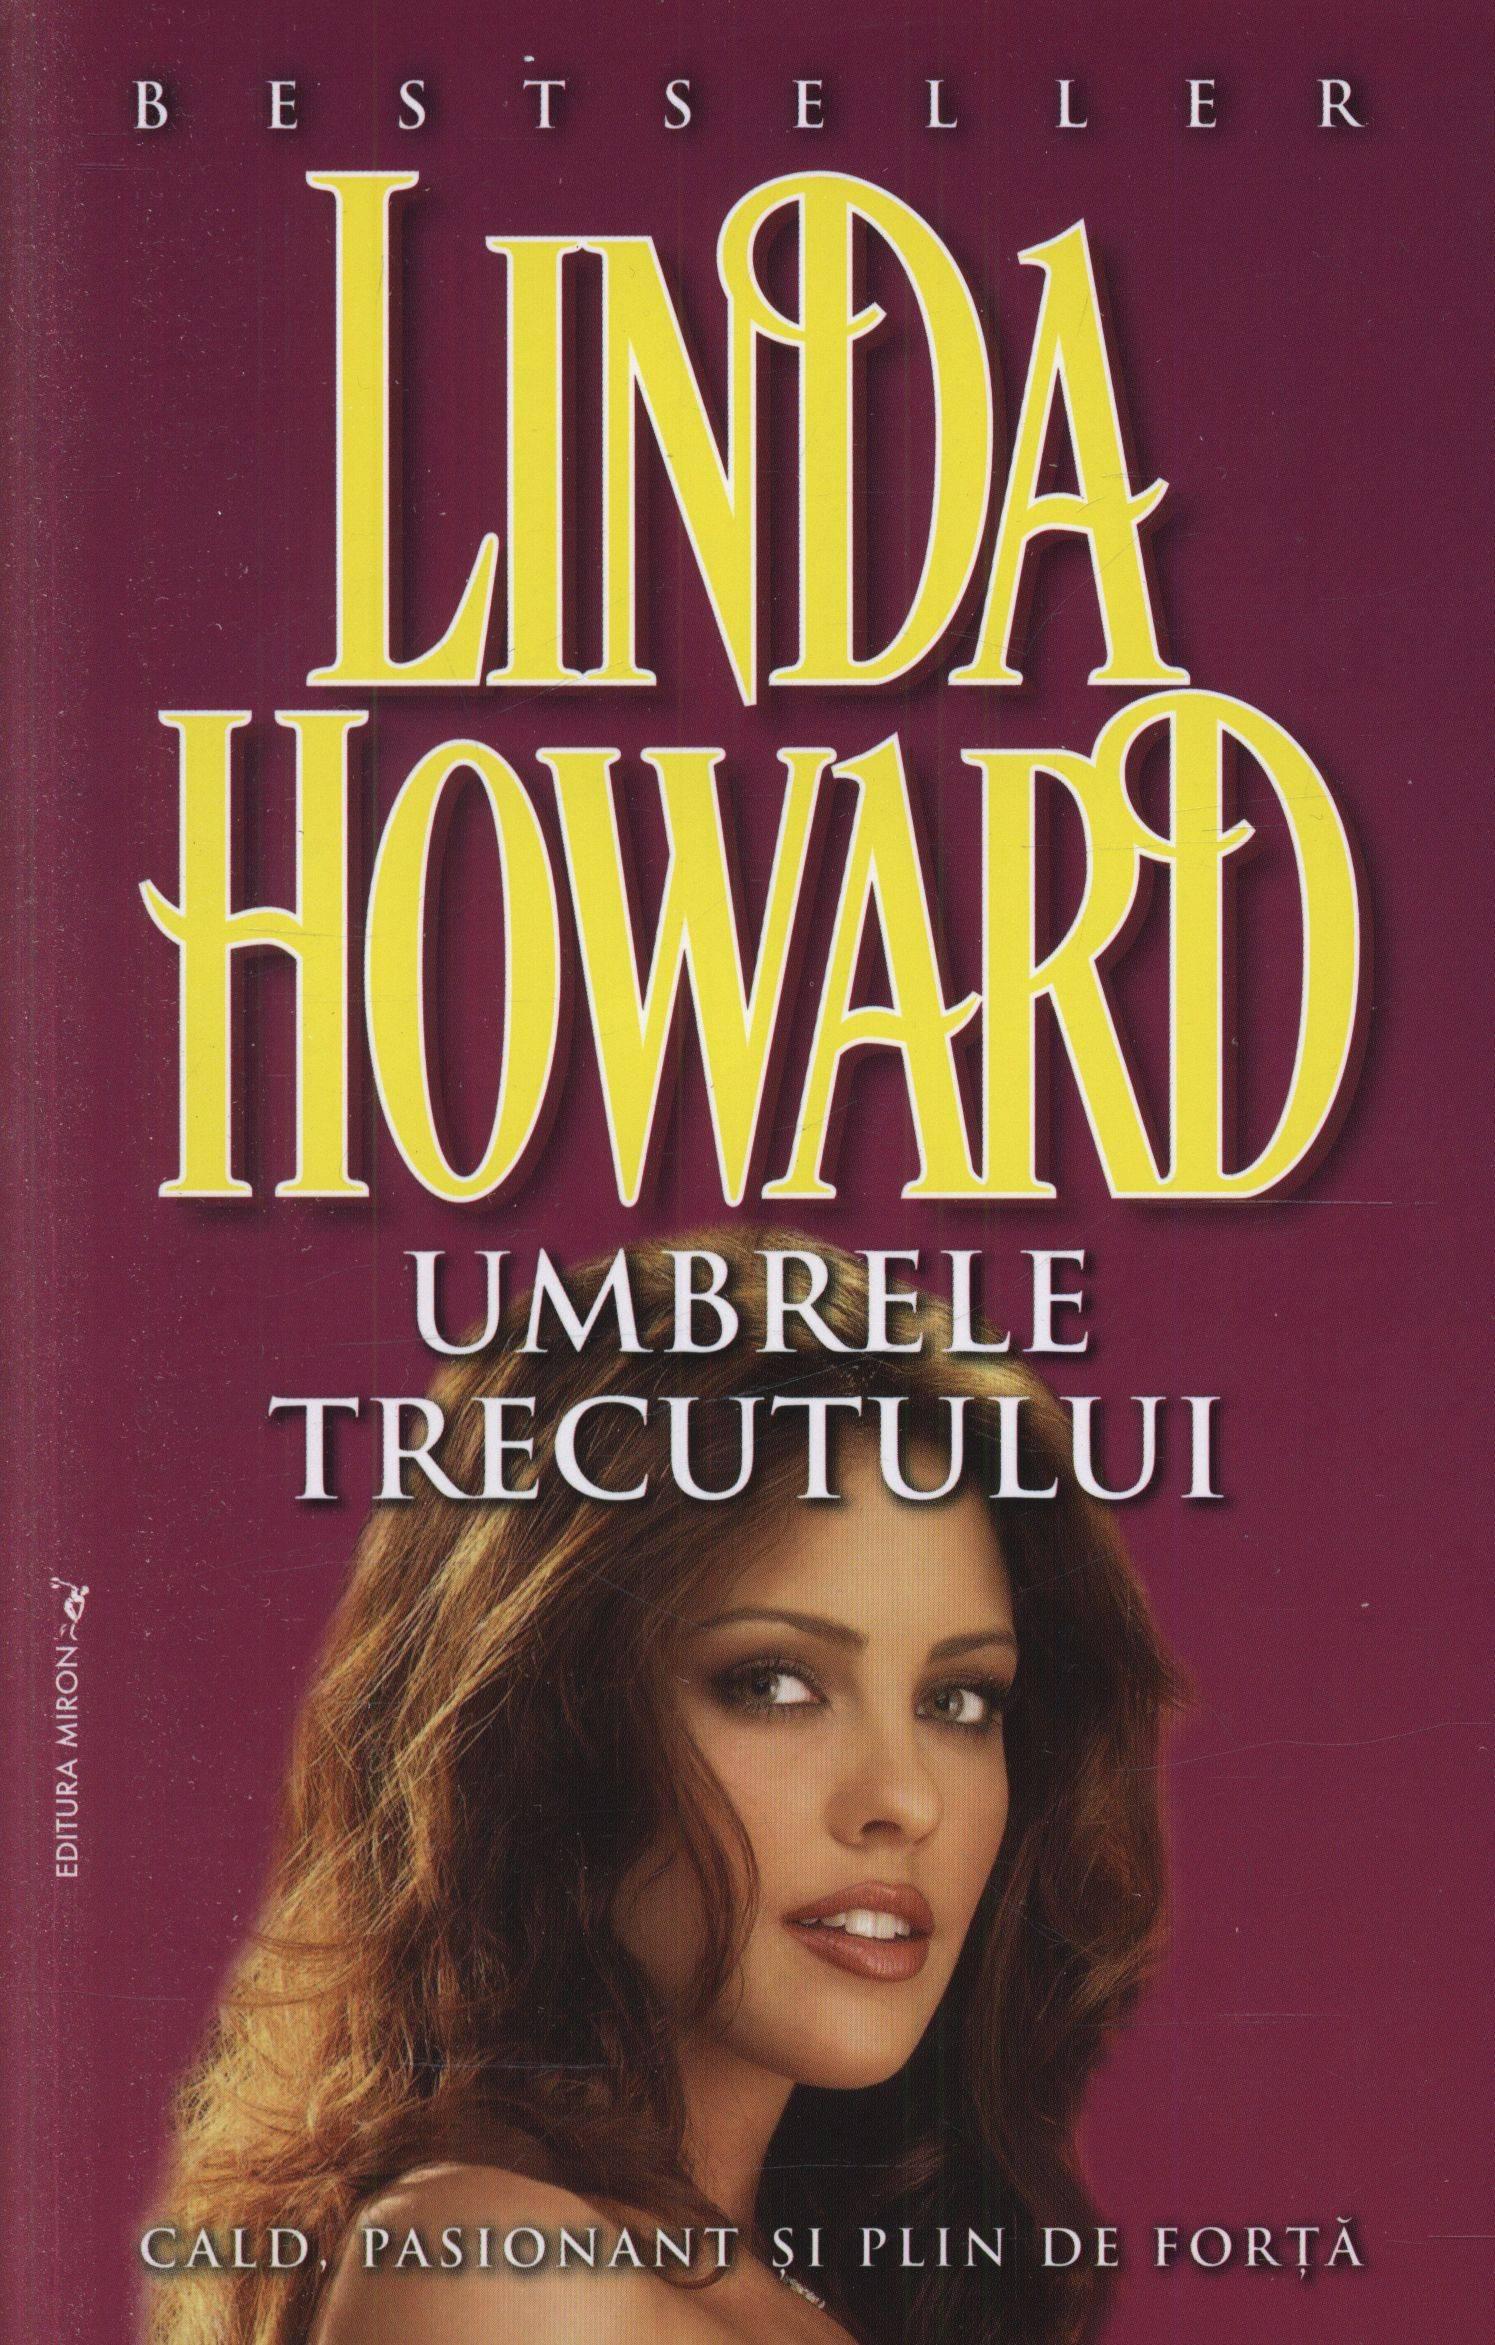 Umbrele trecutului - Linda Howard - Editura Miron - recenzie